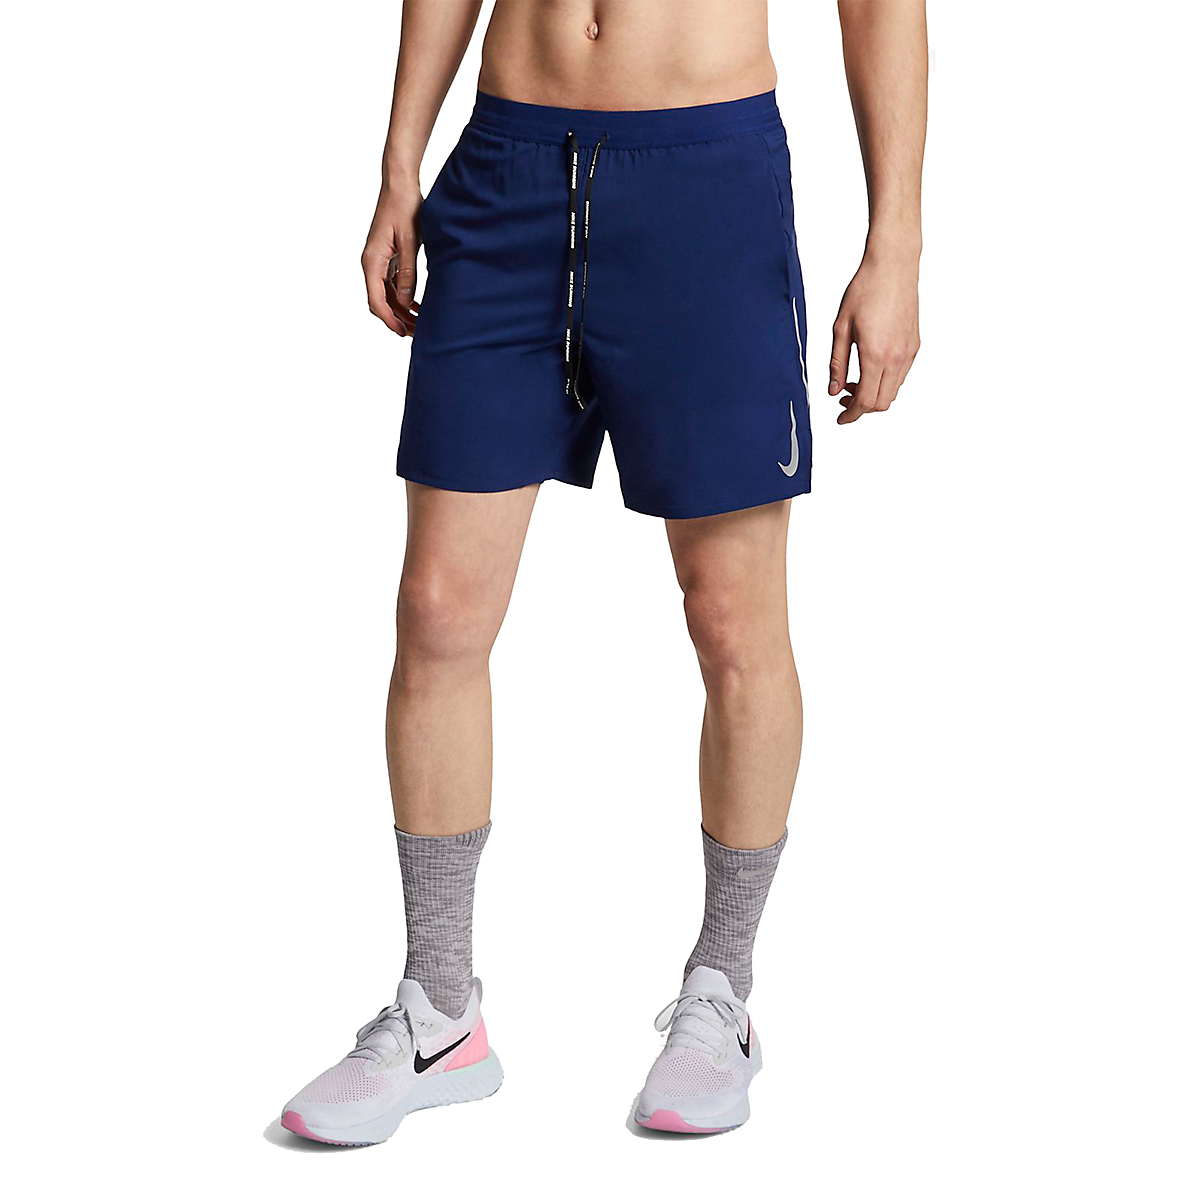 Men's Nike Dri-FIT Flex Stride 7 Inch 2-in-1 Short - Color: Blue Void/Blue Void/Reflective Silver - Size: S, Blue Void/Blue Void/Reflective Silver, large, image 1